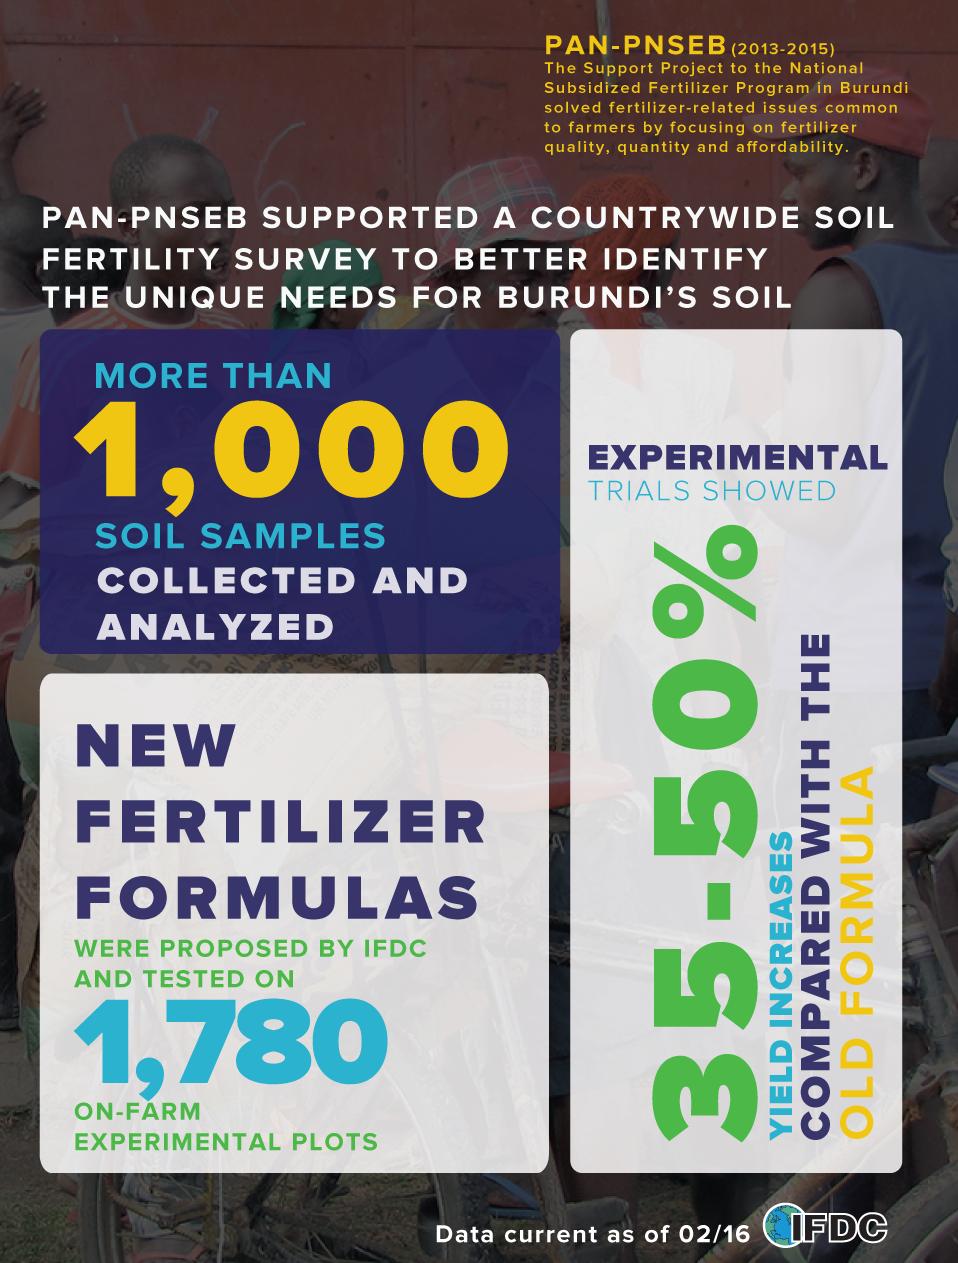 panpnseb_infographic2_final